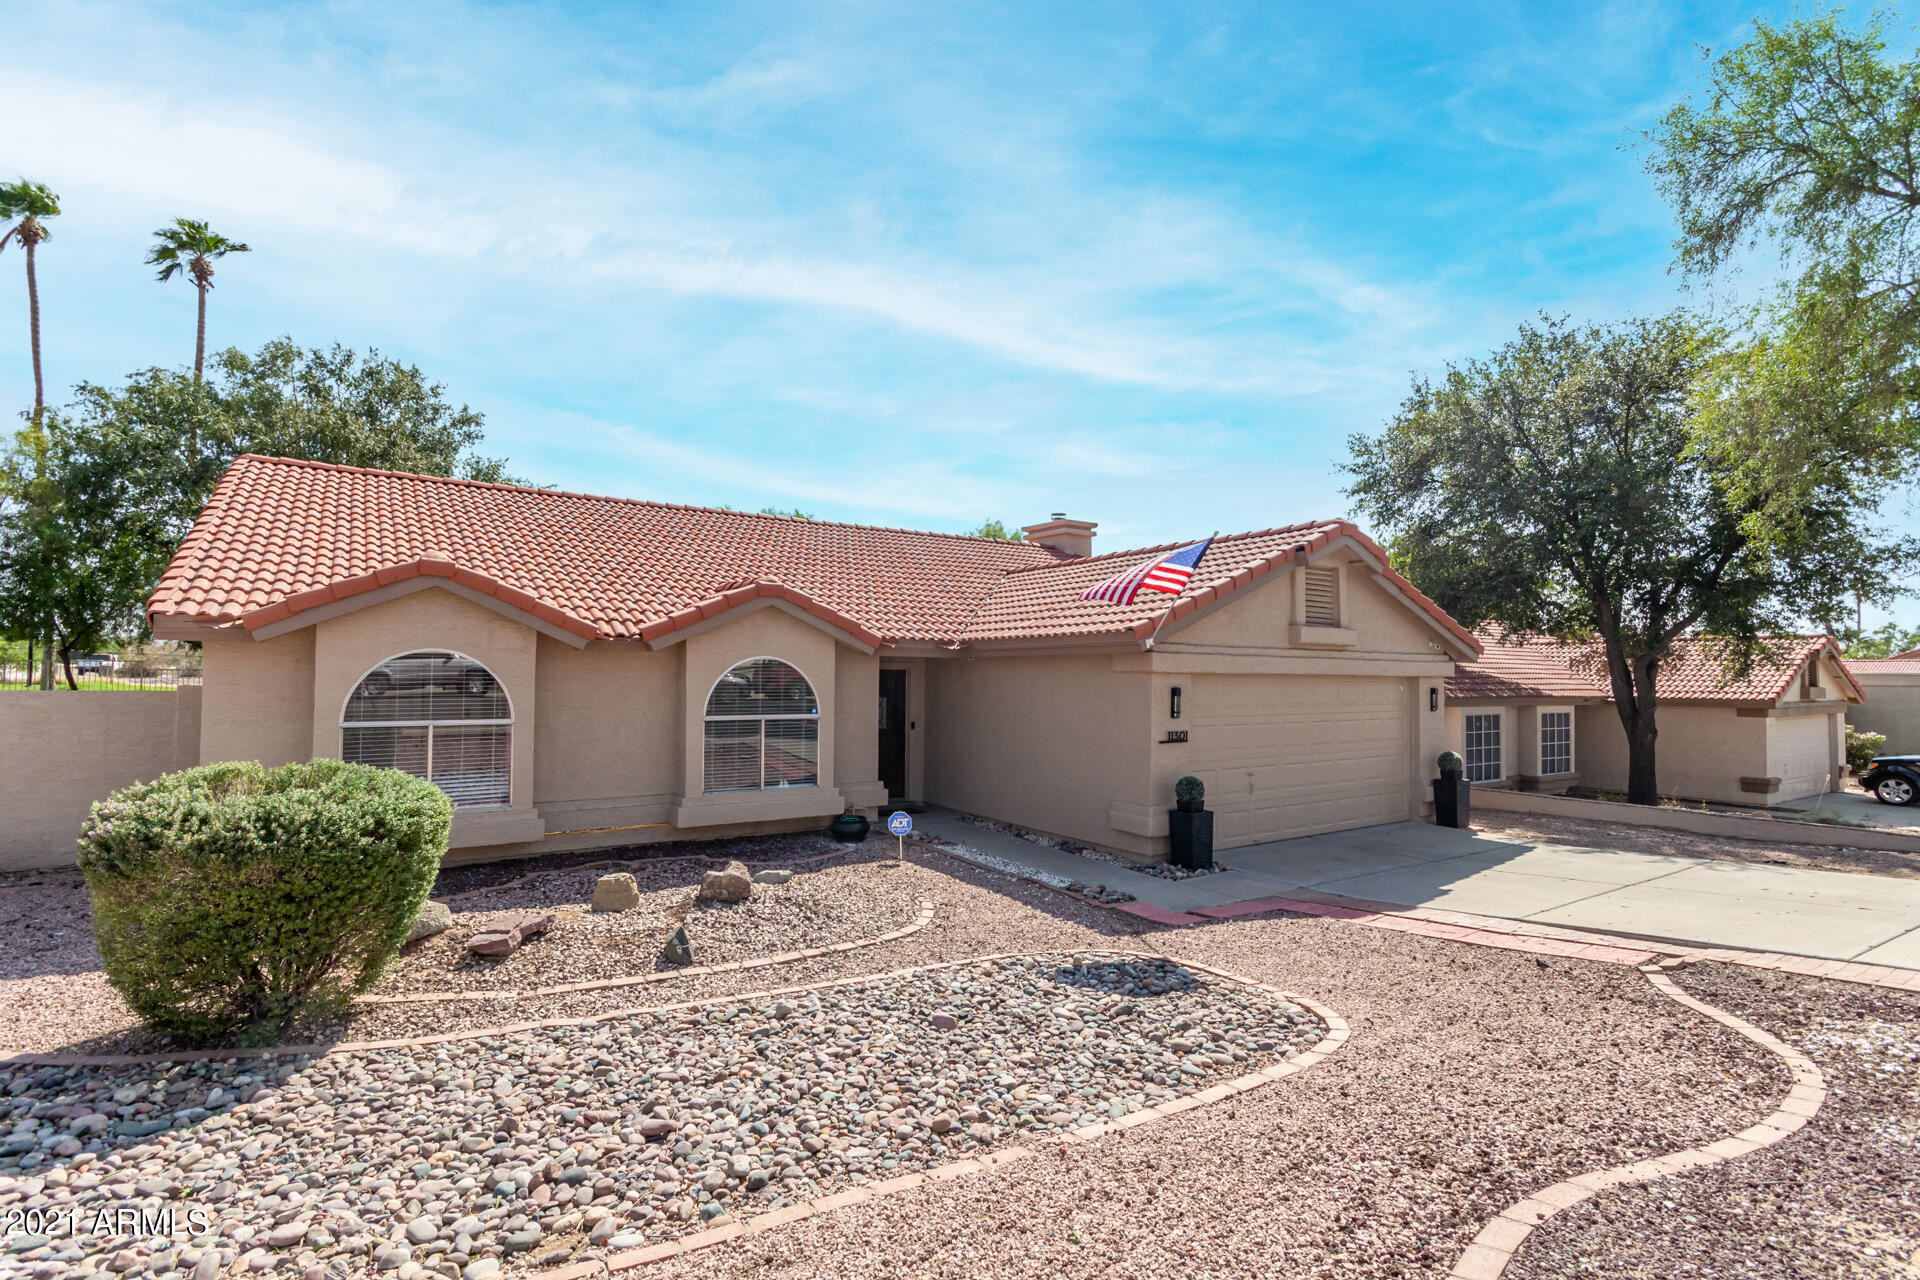 Photo of 11301 W ORANGE BLOSSOM Lane, Avondale, AZ 85392 (MLS # 6292803)